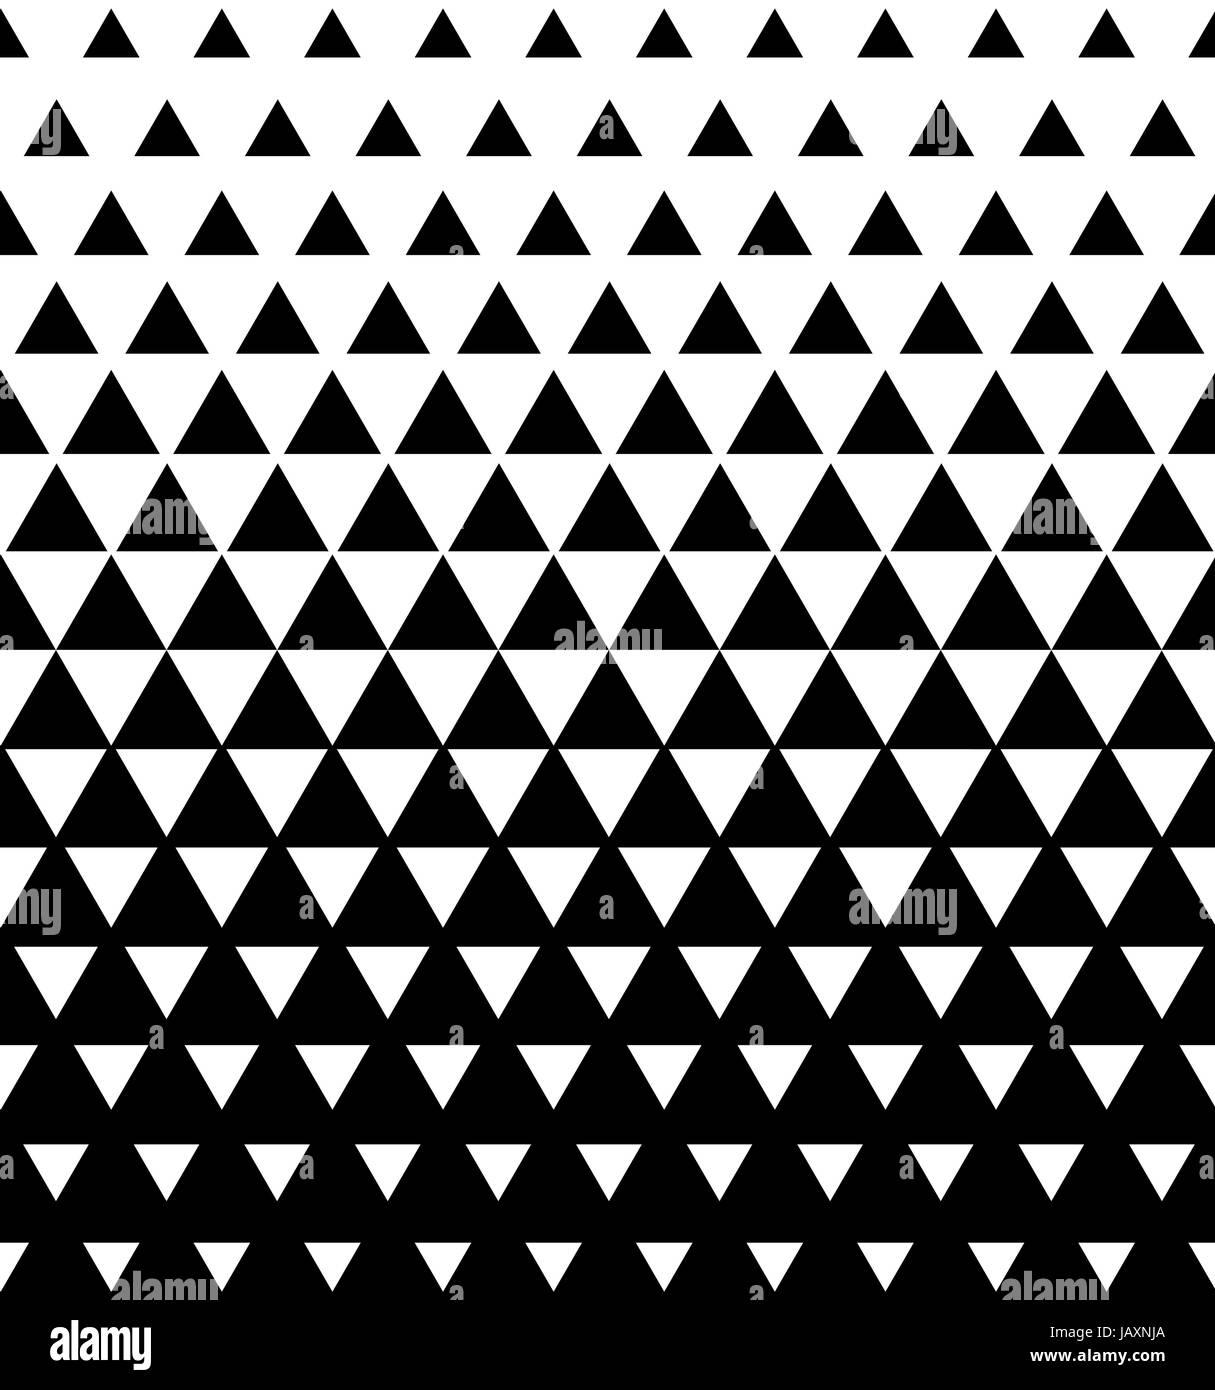 halbton dreieckigen muster vektor abstrakte bergang dreieckigen muster tapete nahtlose schwarz wei dreieck geometrische - Tapete Schwarz Weis Muster